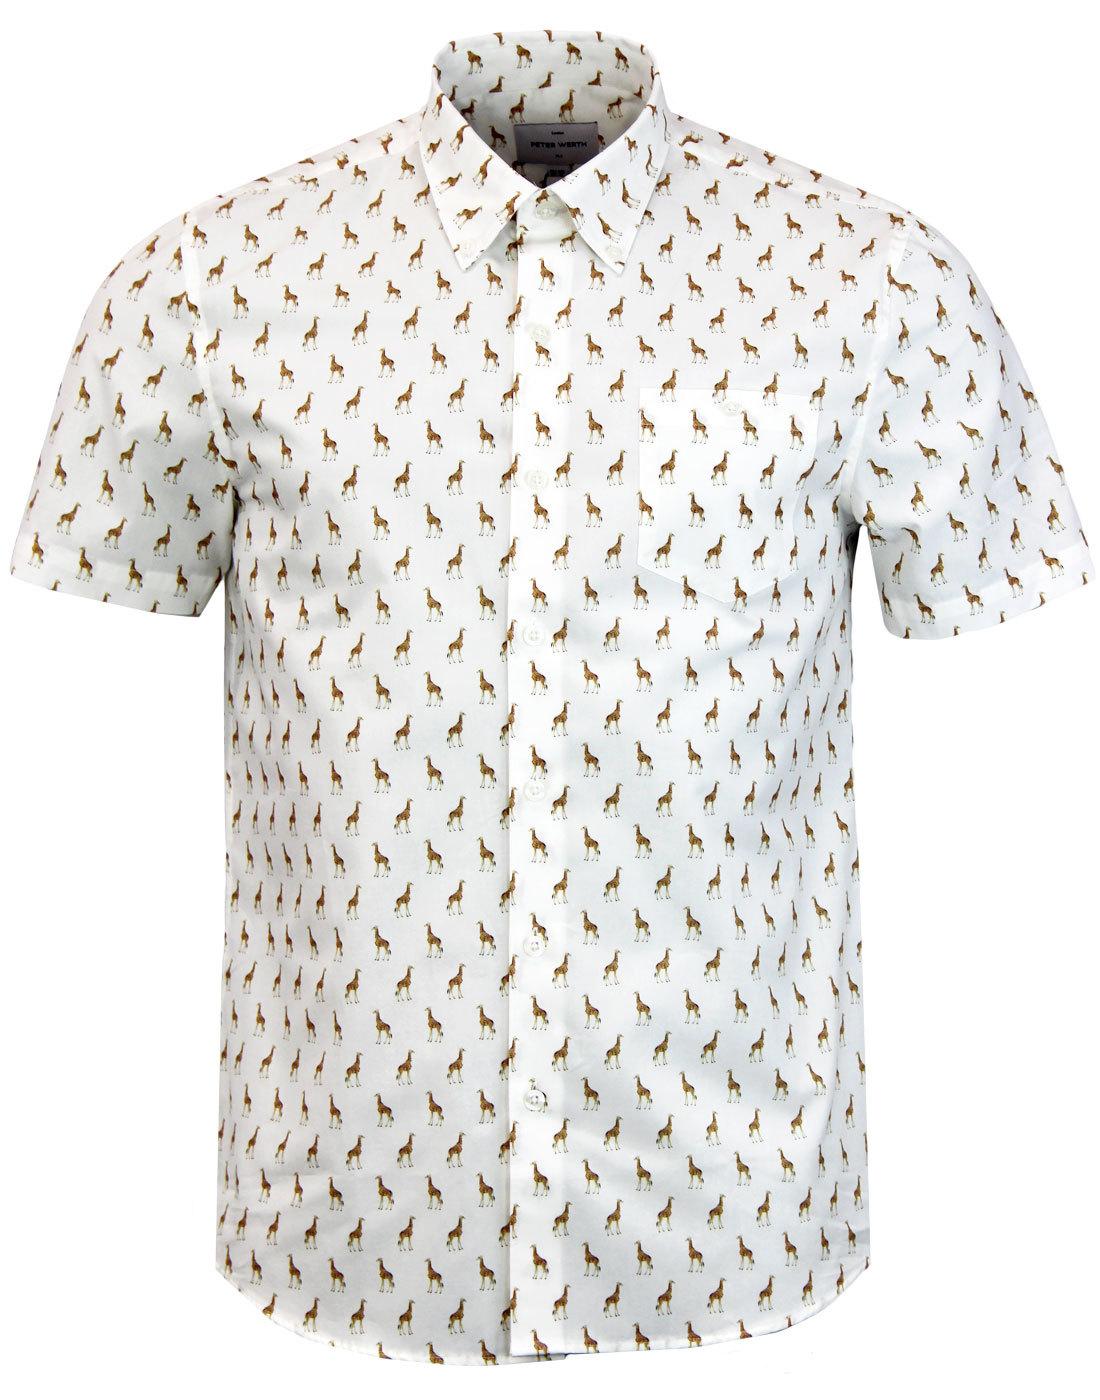 70s White Printed Shirt Pointed Collar Shirt 1970s Shirt